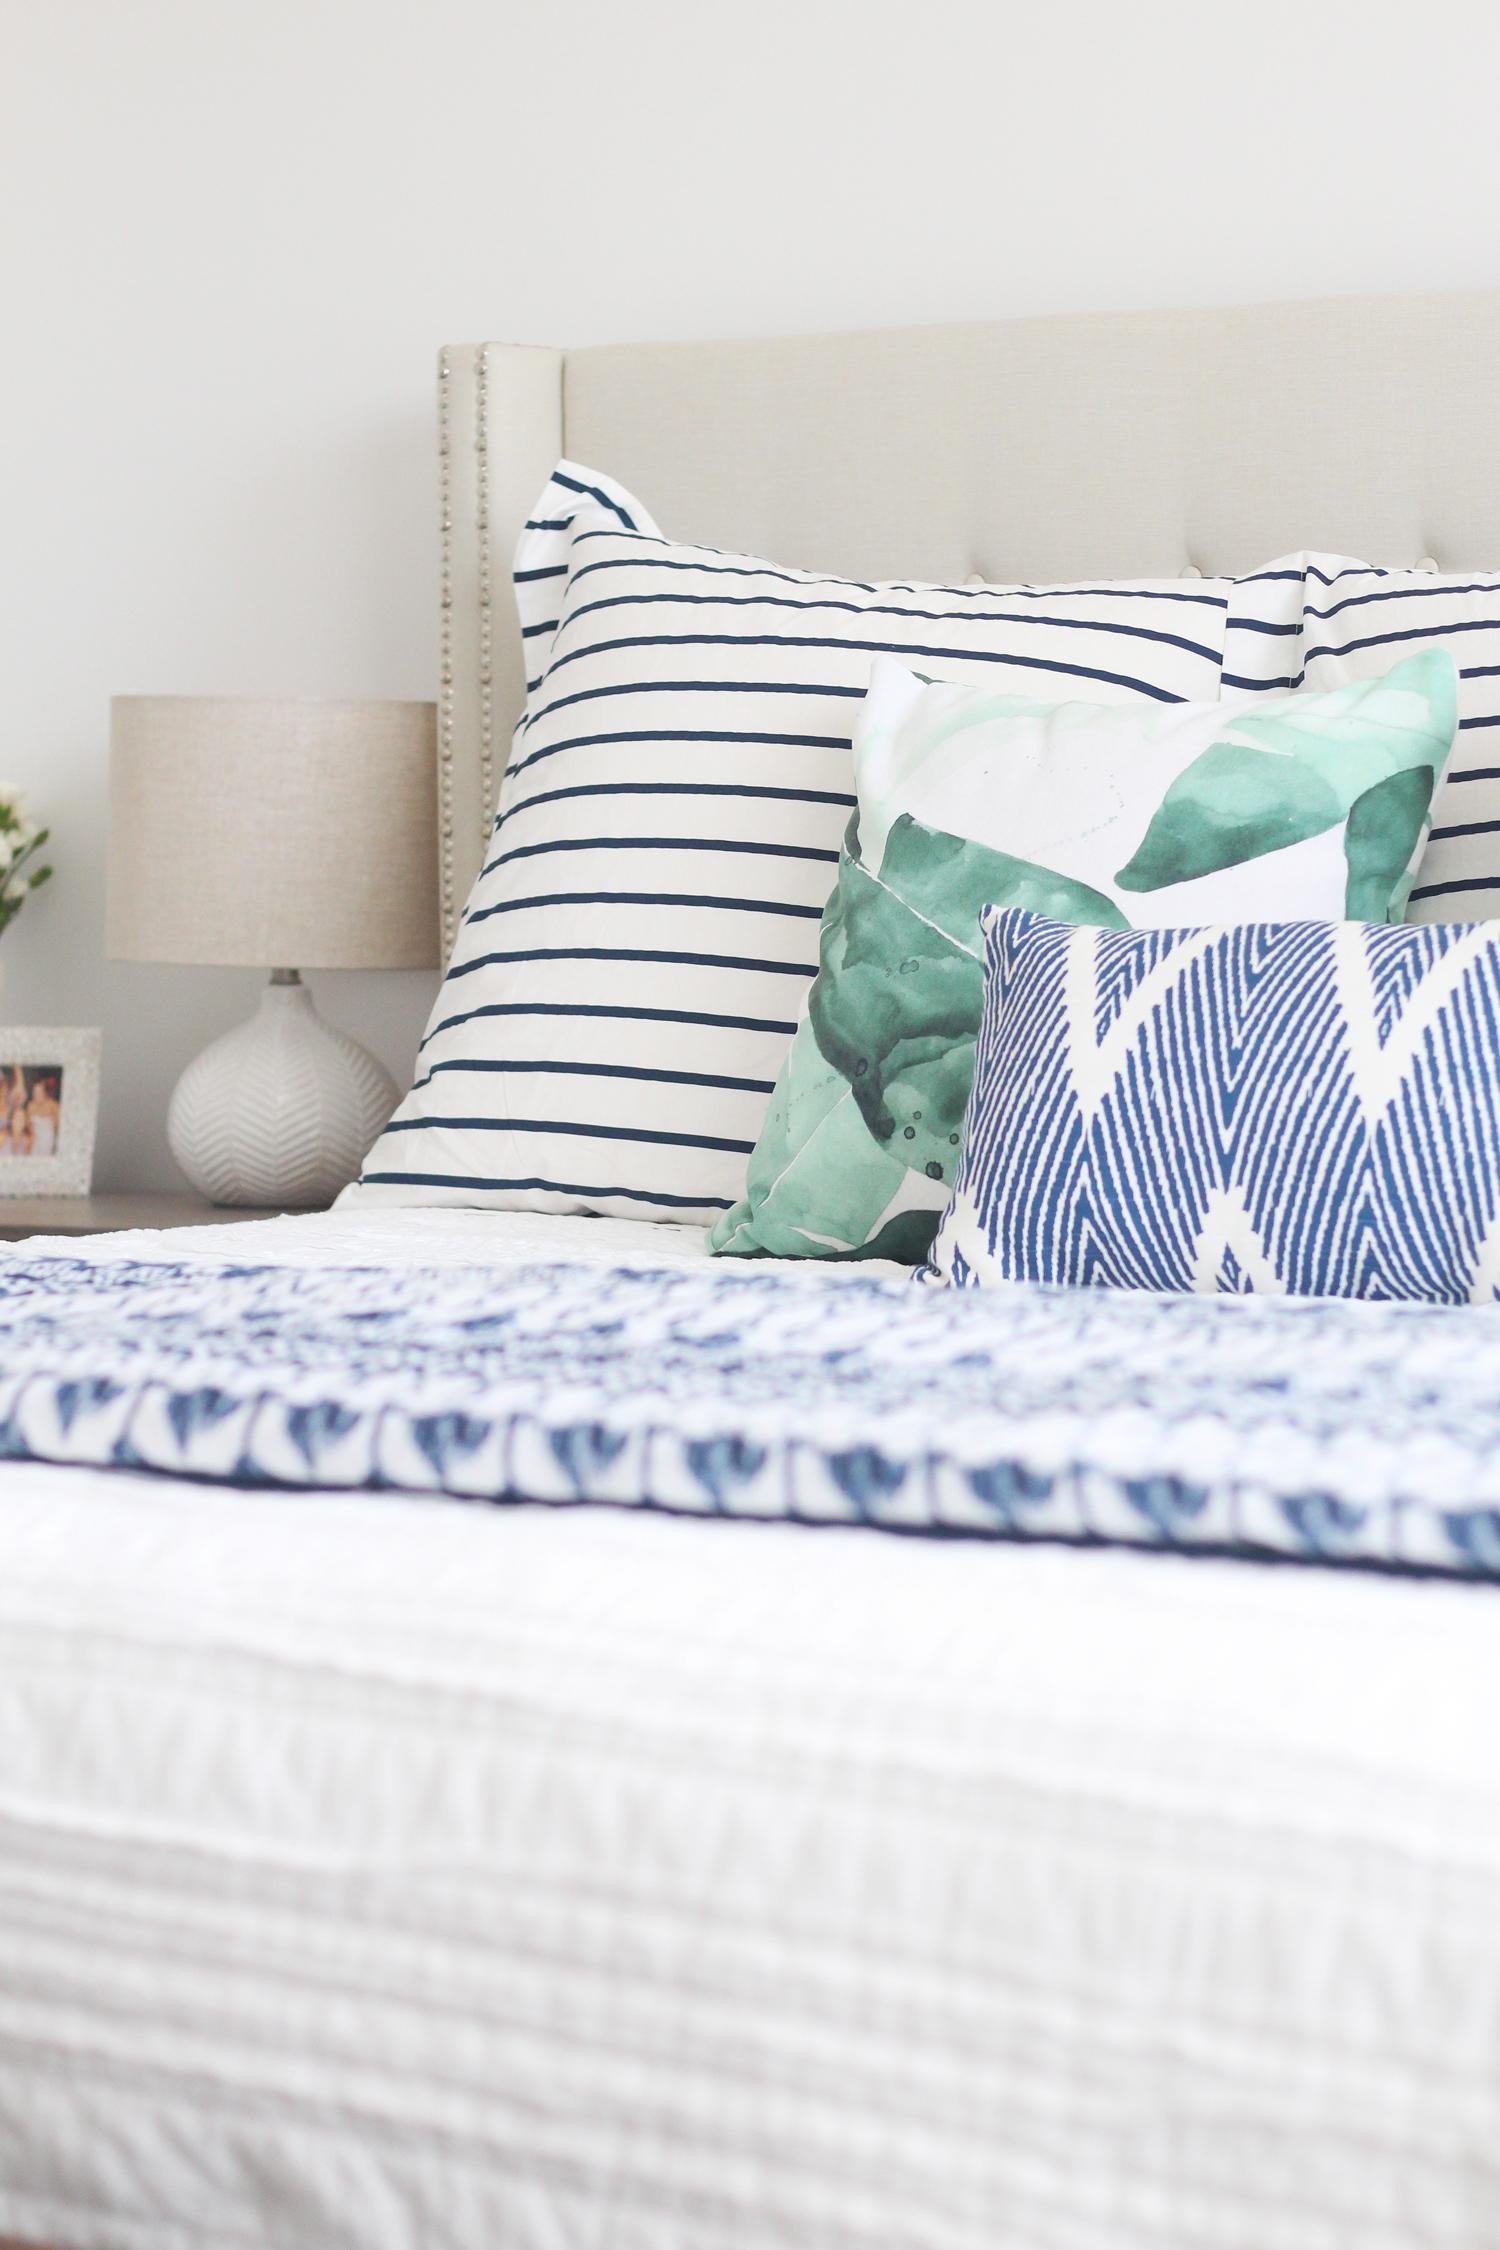 Modern-Farmhouse-Bedroom-Blue-Green-White-Mix-&-Match-Design-14.jpg